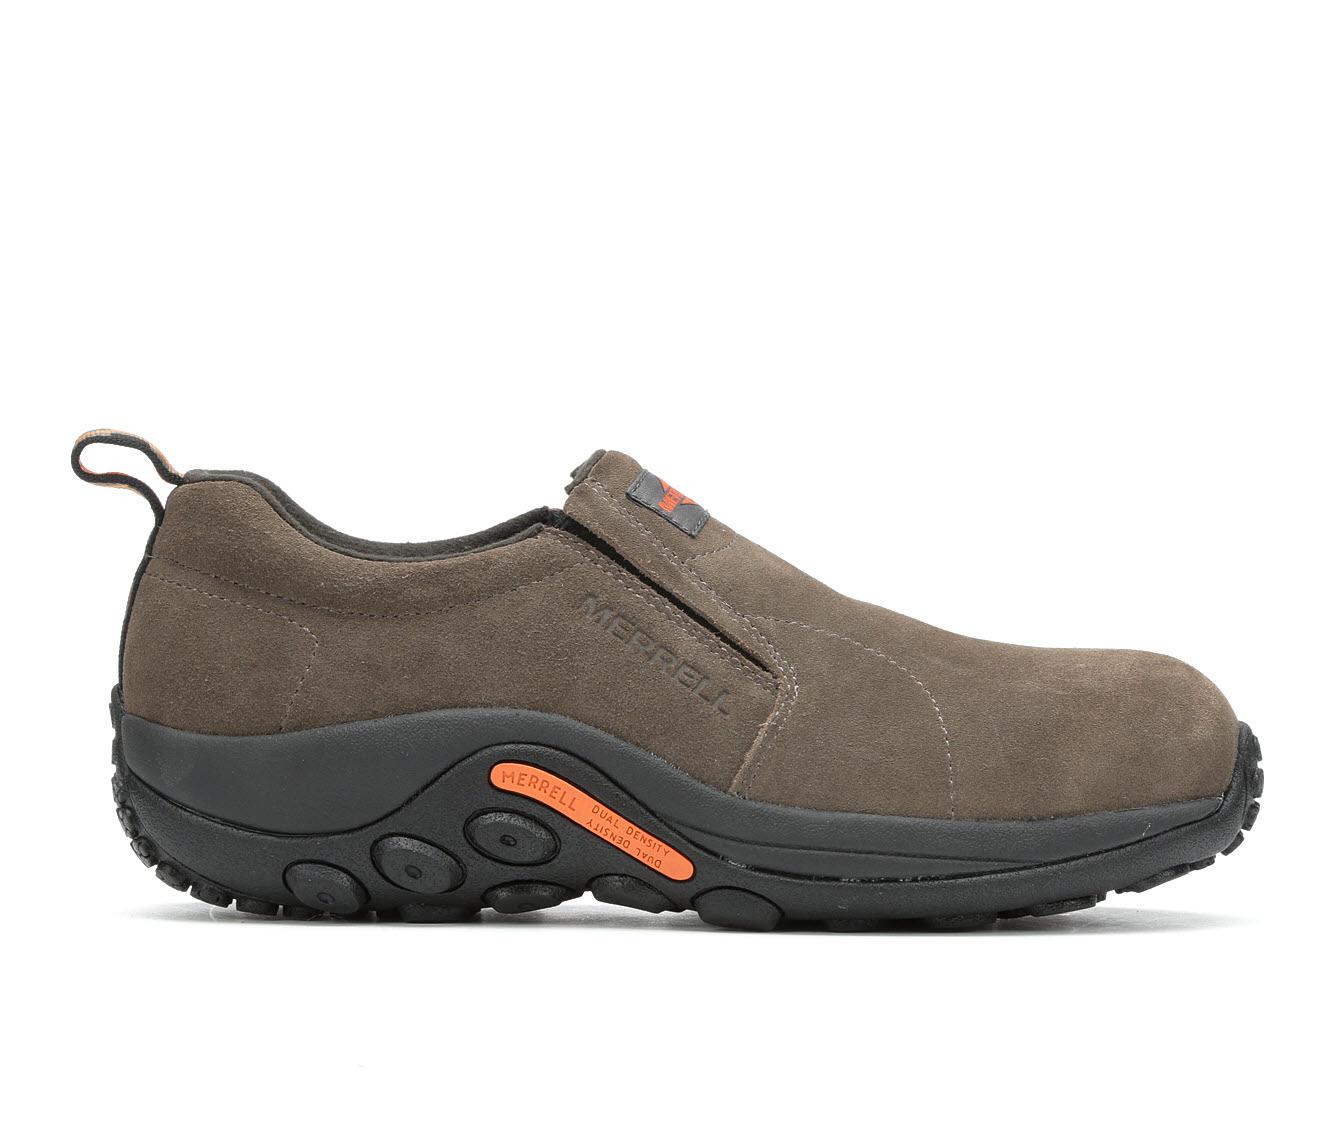 Merrell Work Jungle Moc Alloy Toe Men's Boots (Brown Suede)